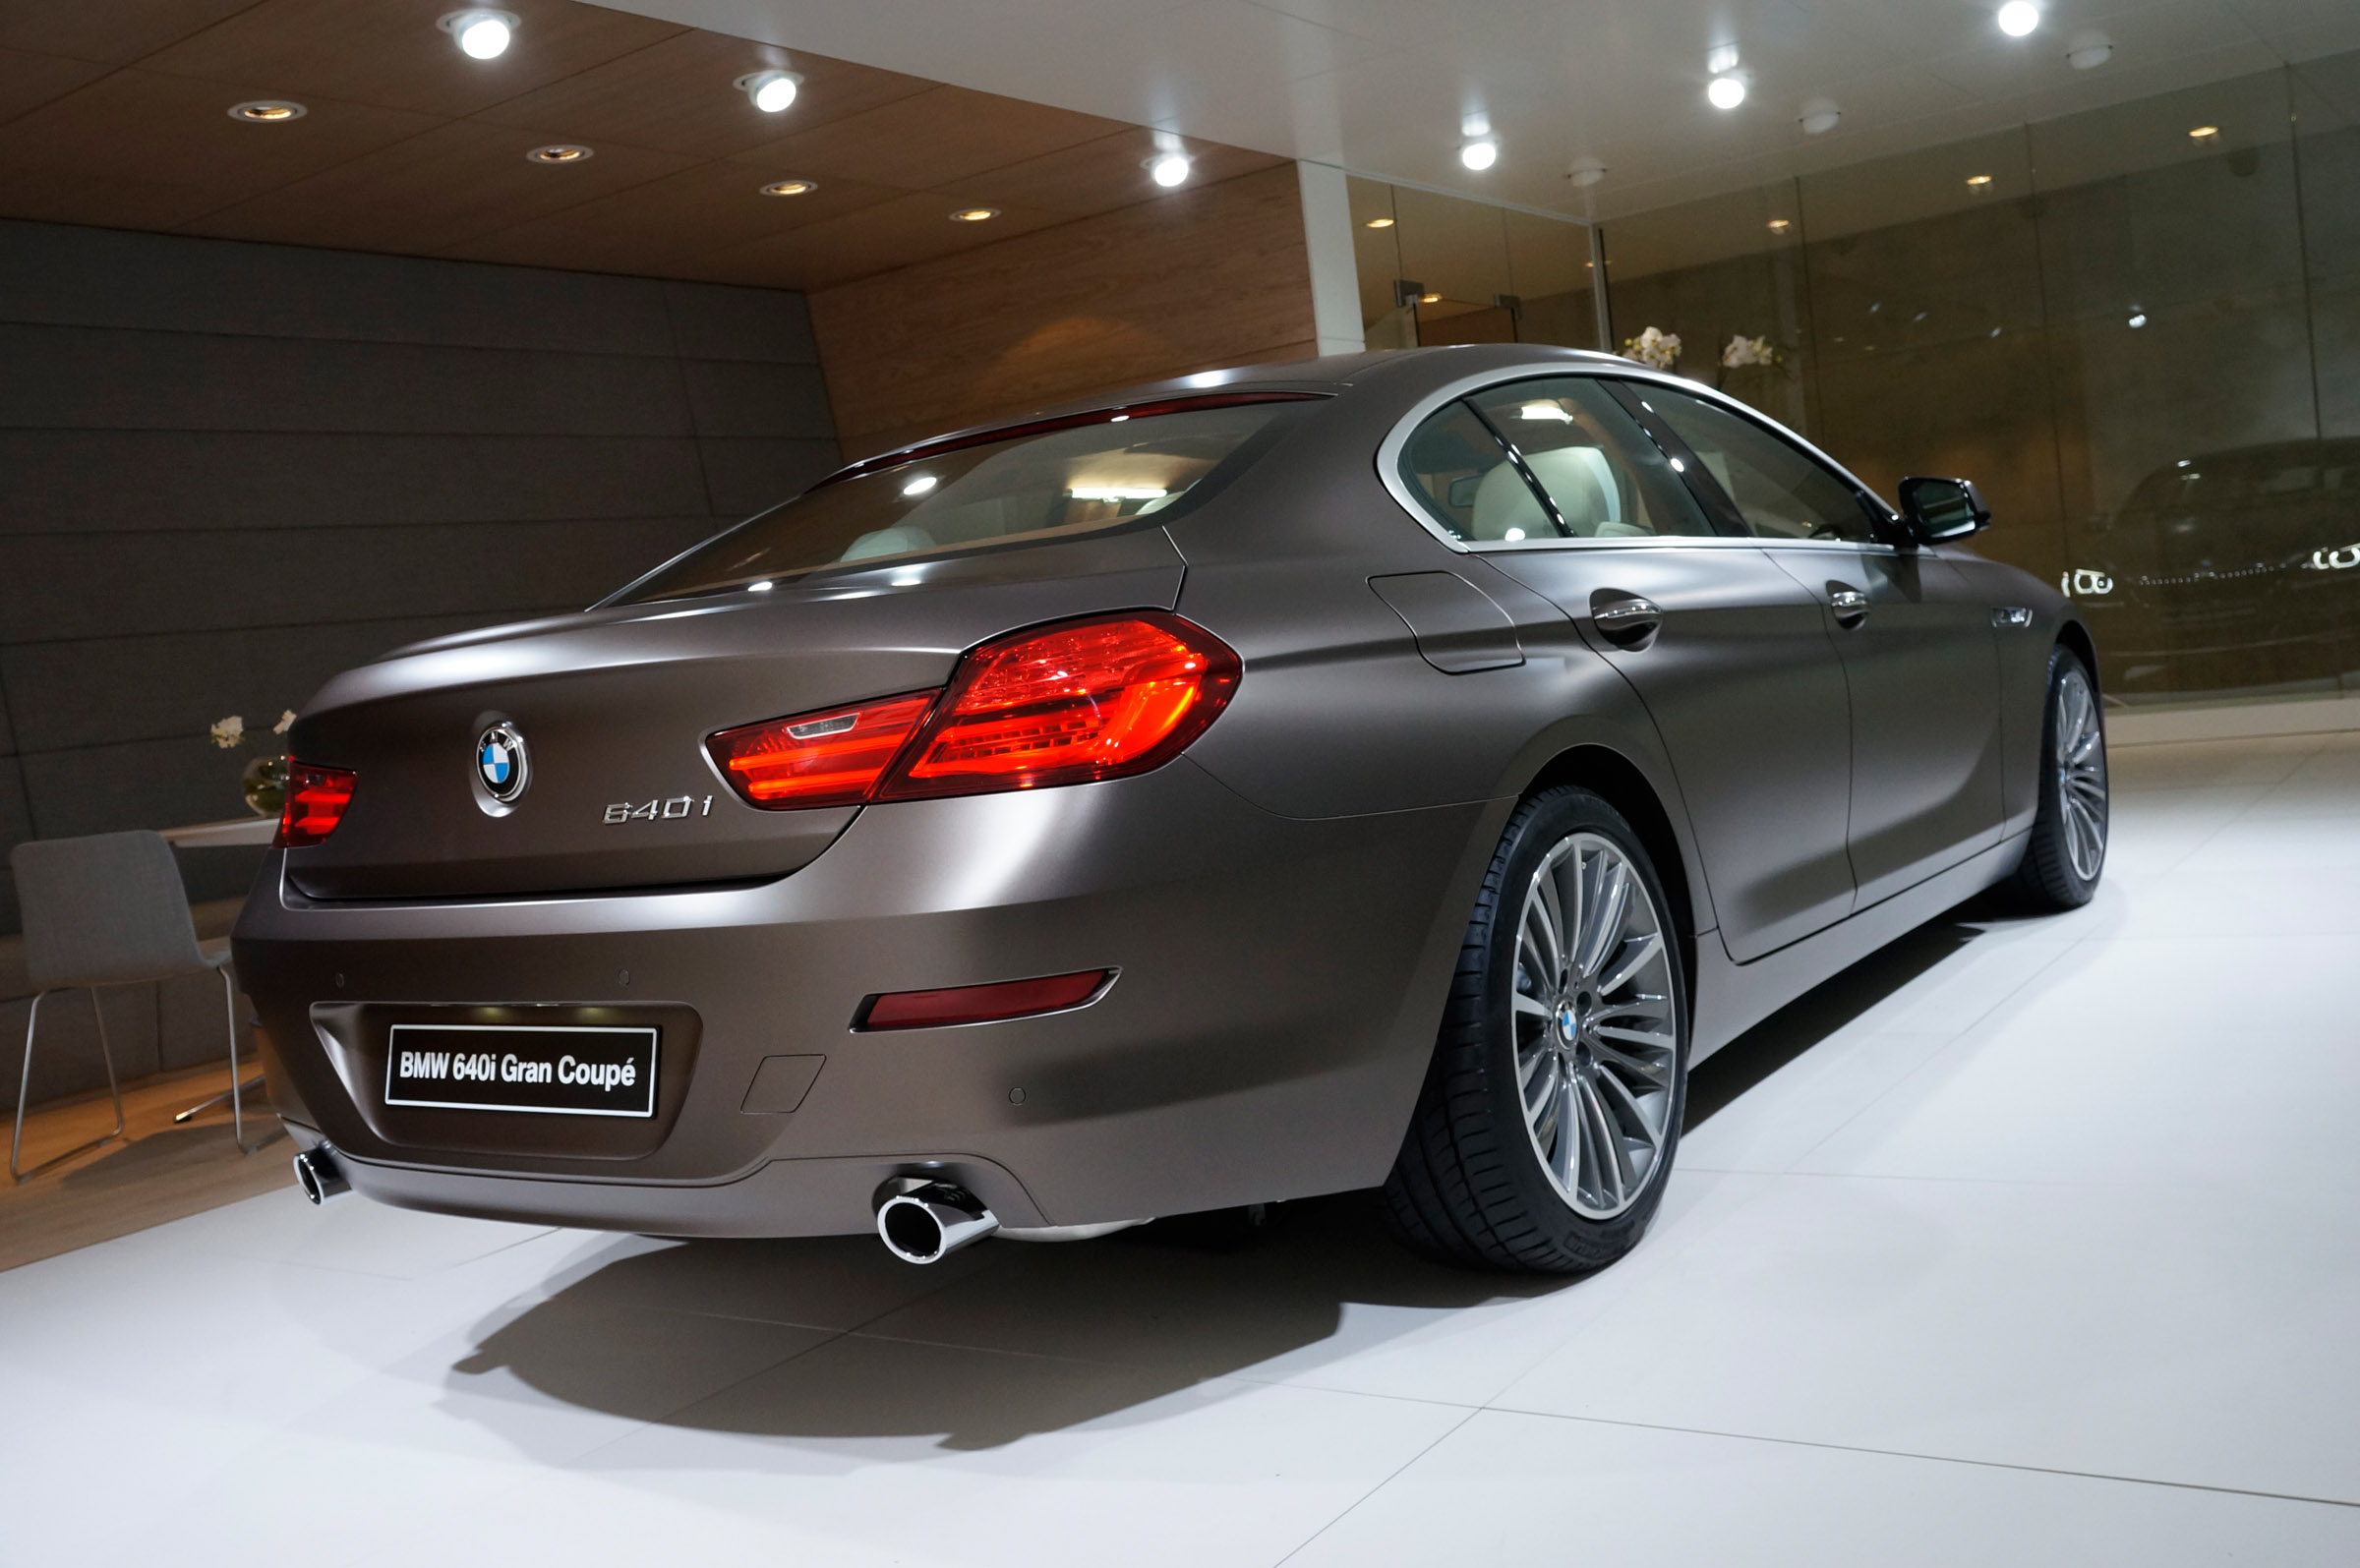 BMW I Gran Coupe Geneva Picture - 2012 bmw 640i gran coupe